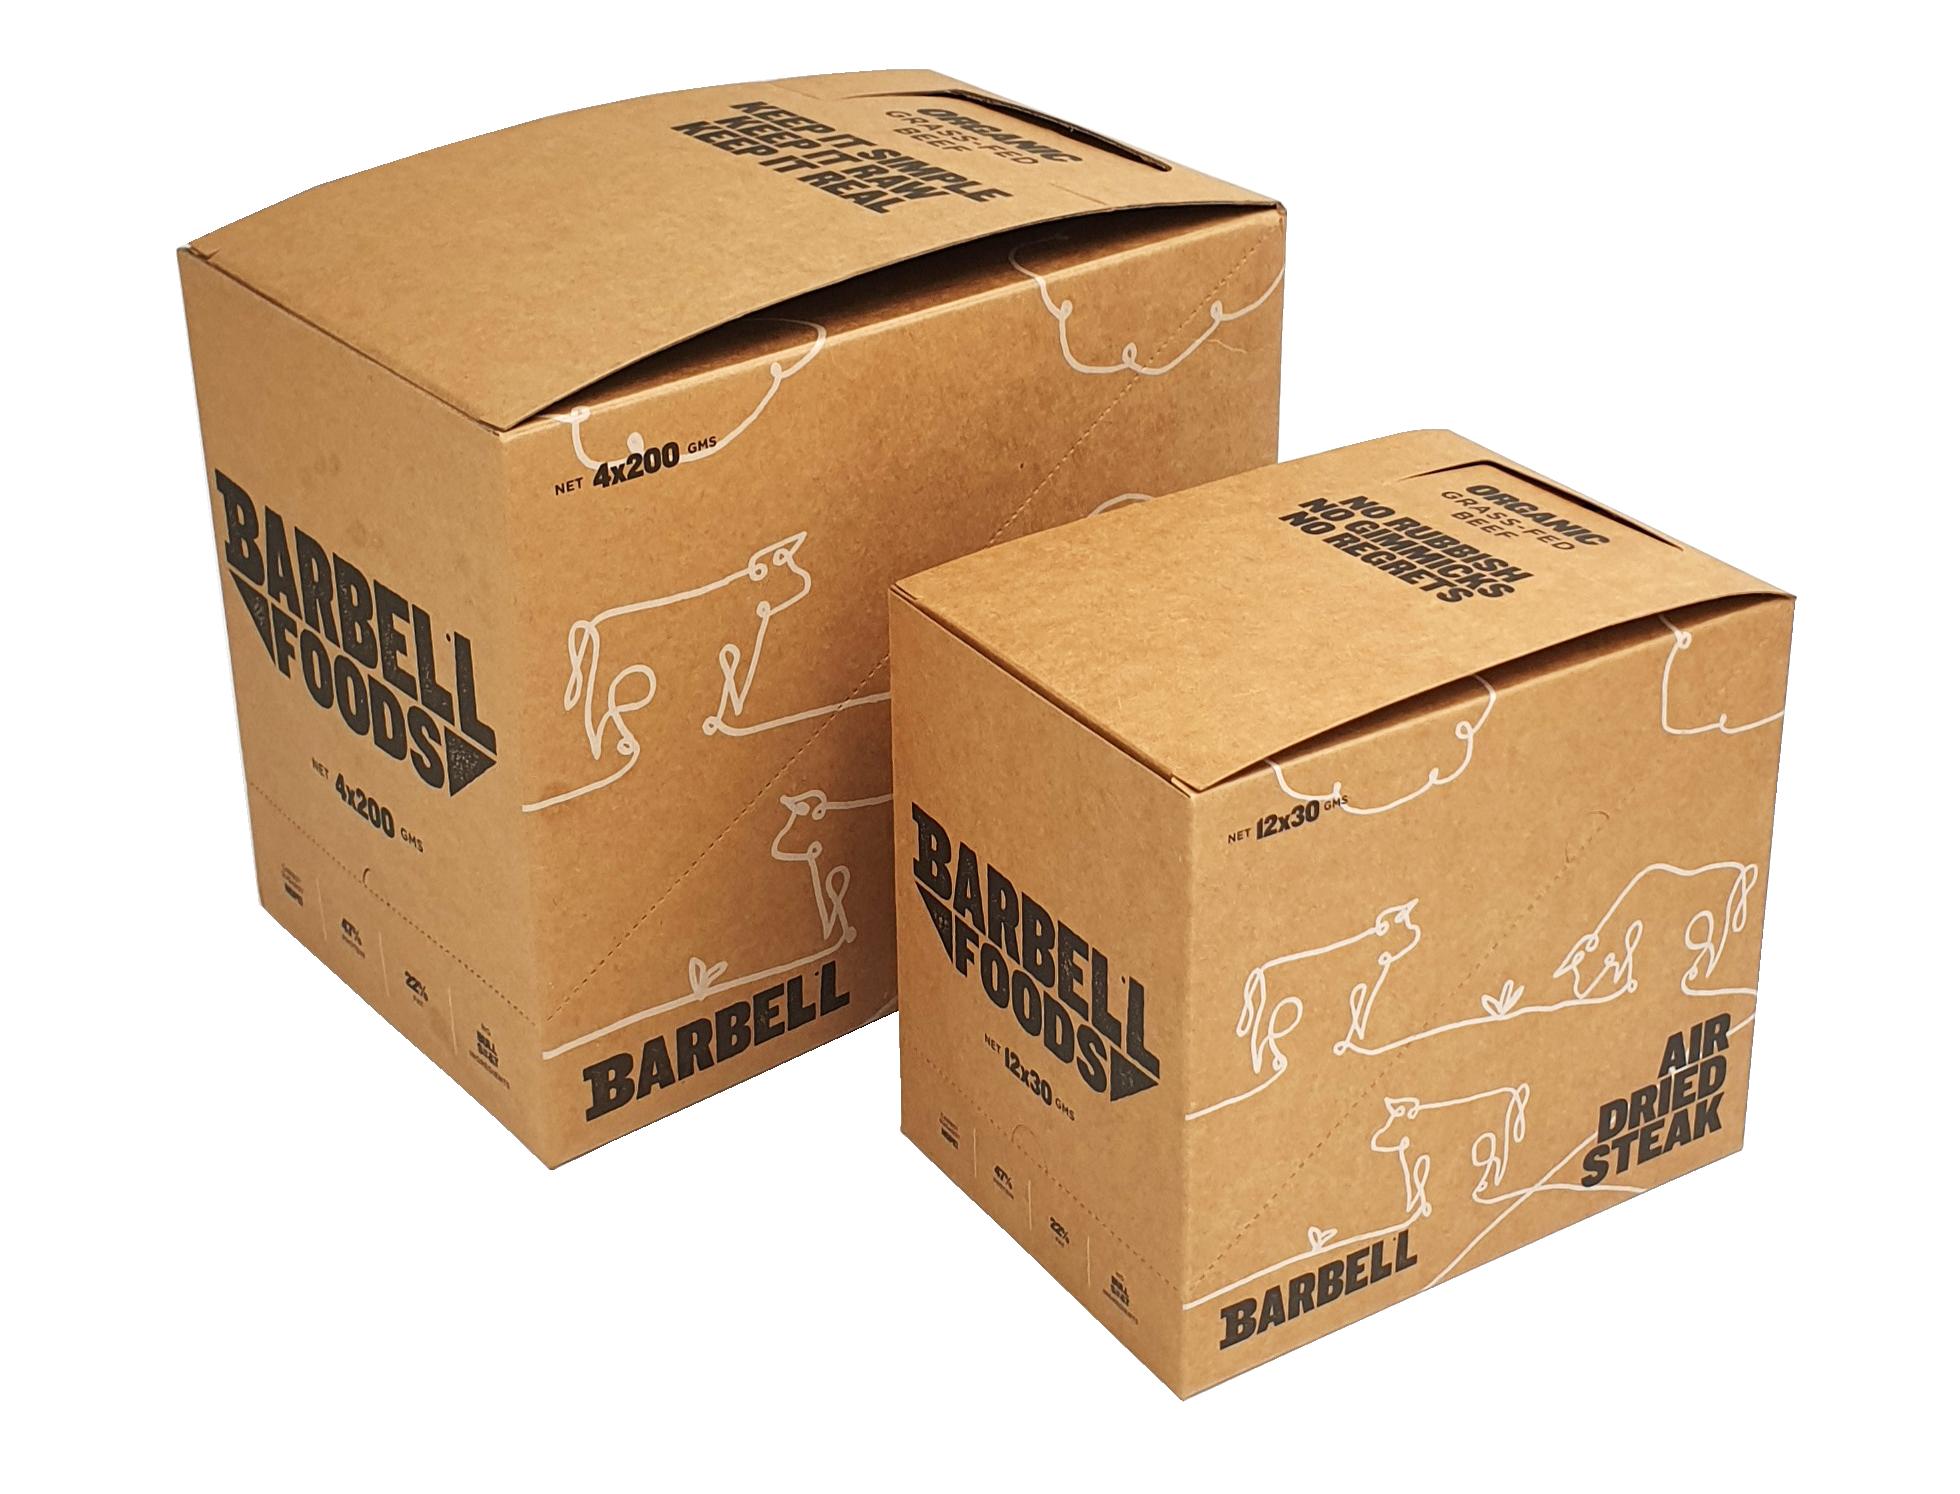 shipper carton 2.png